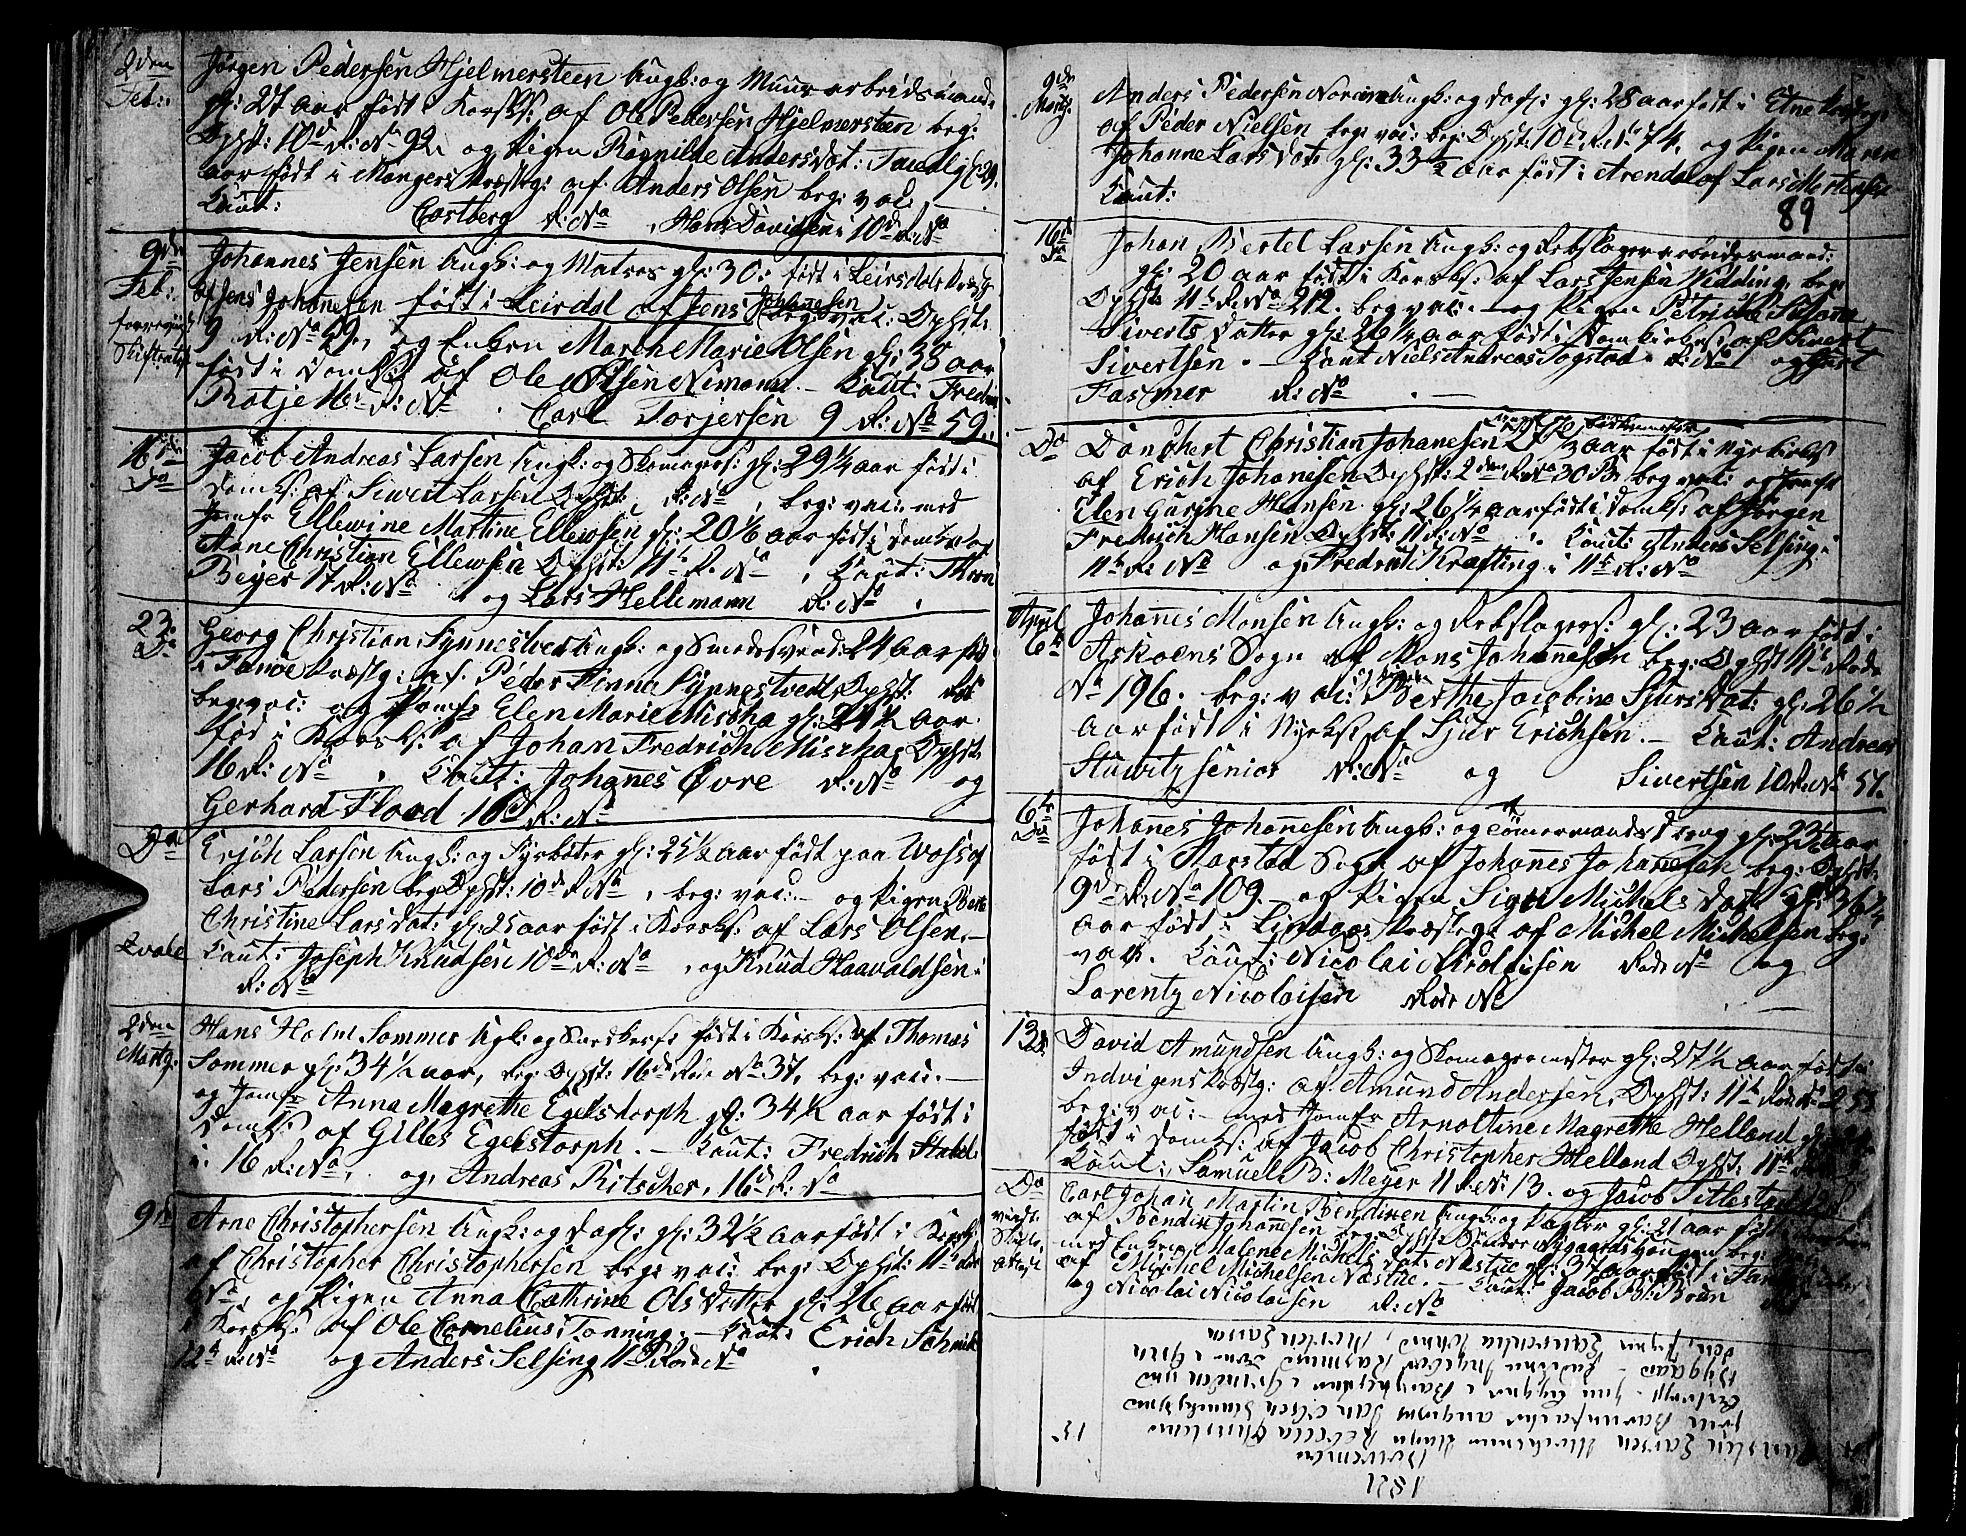 SAB, Domkirken sokneprestembete, H/Hab/L0003: Klokkerbok nr. A 3, 1820-1853